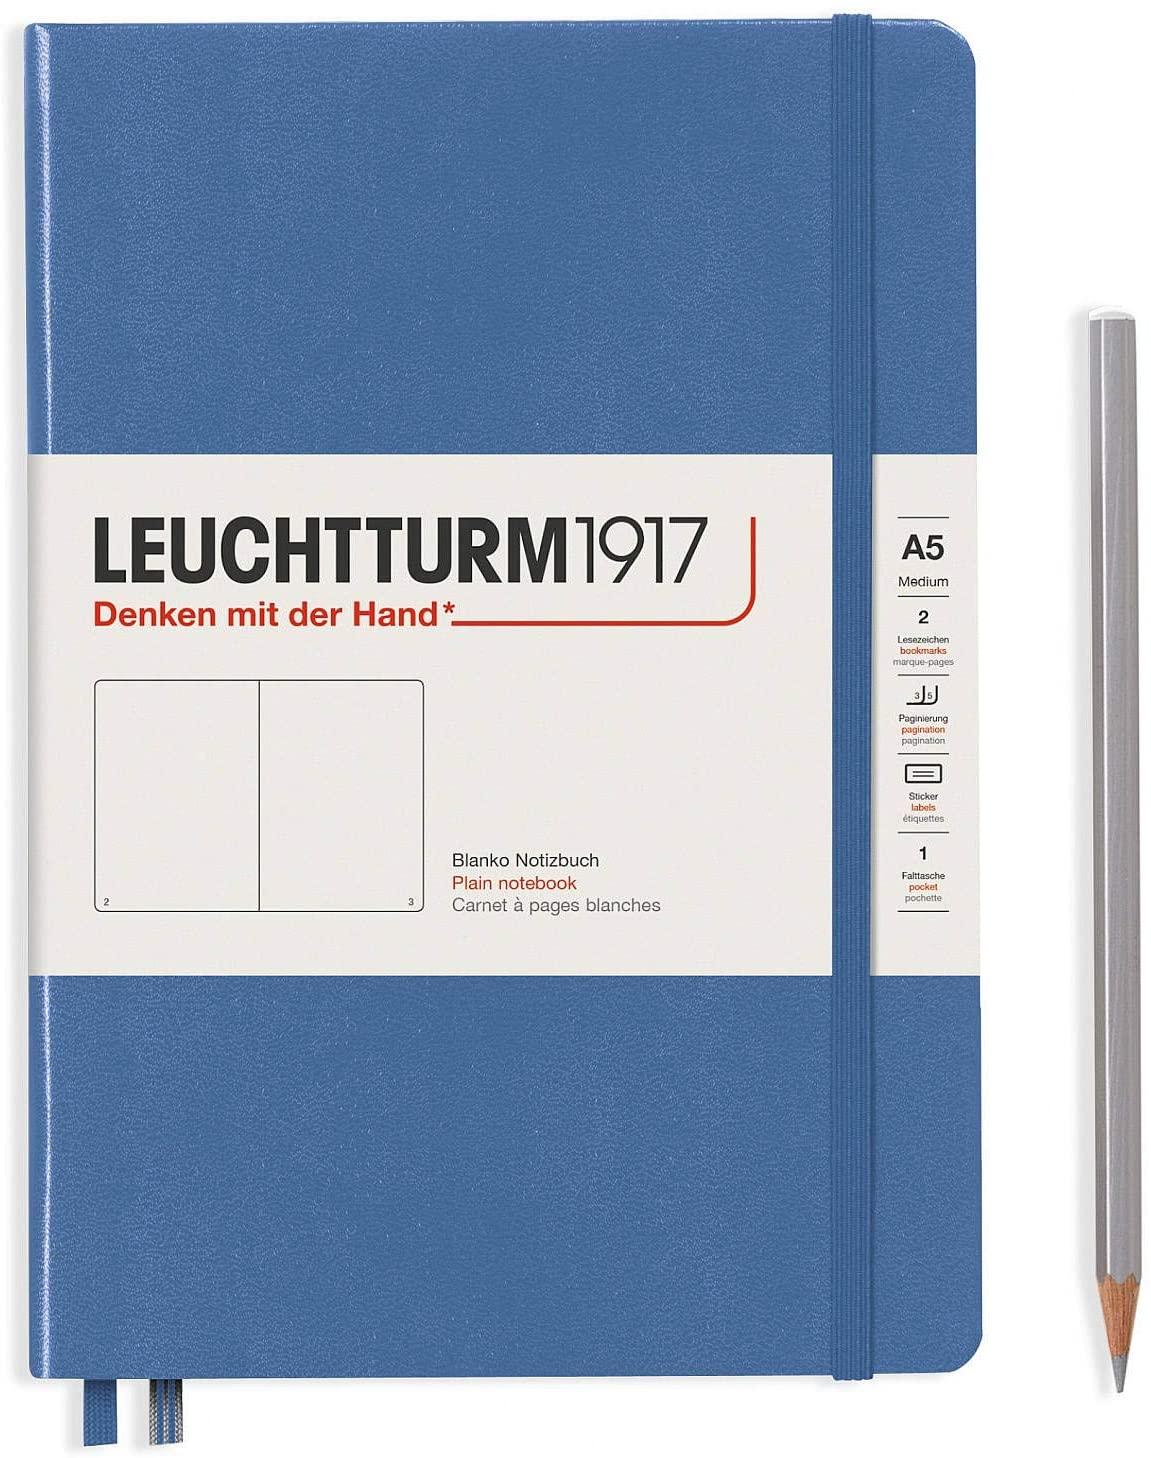 Leuchtturm1917 Notebooks Hardcover Medium (A5) Denim, Medium, 251 p, plain